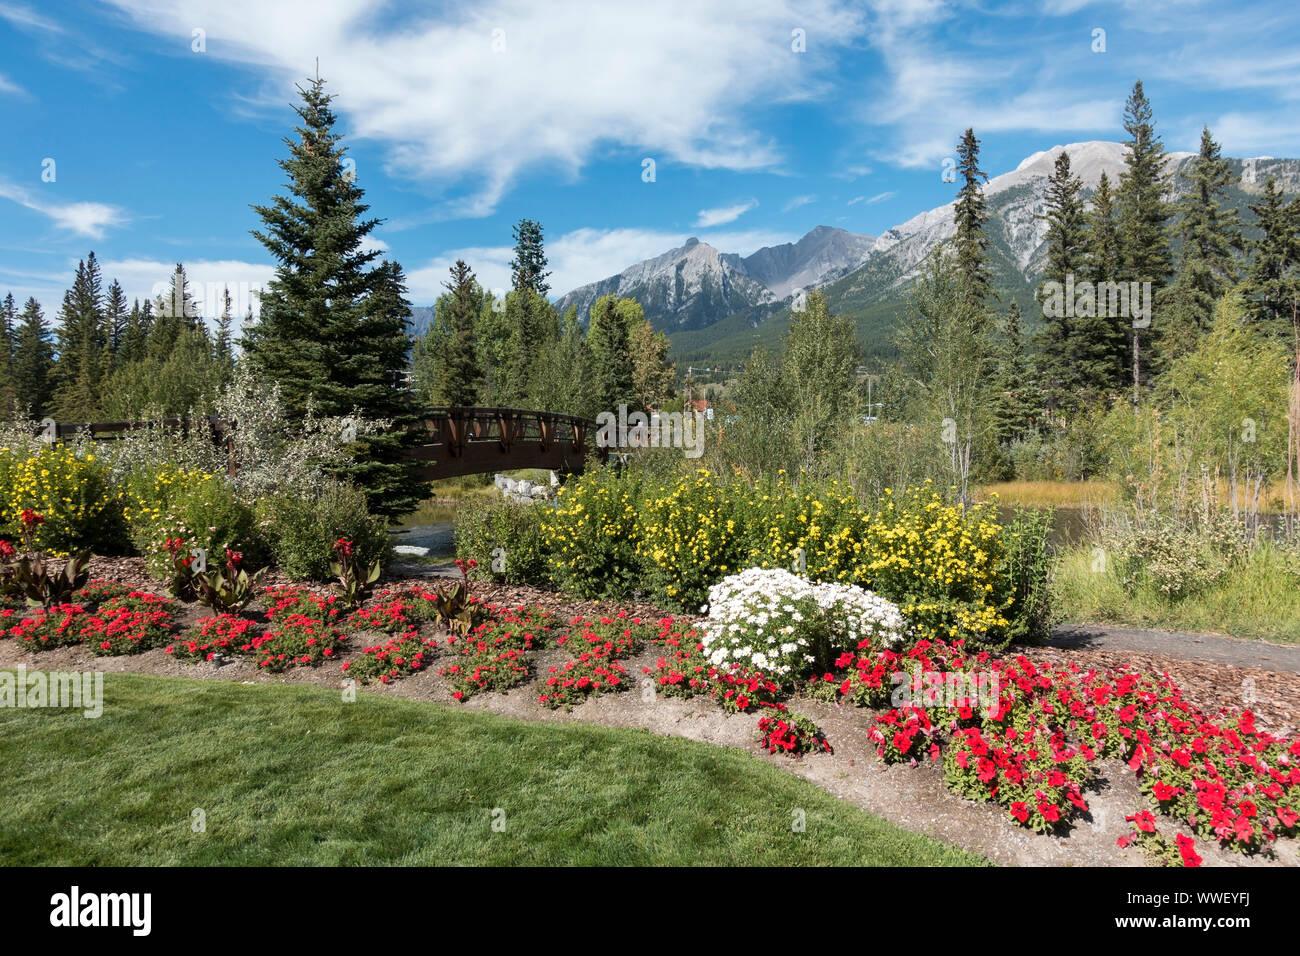 garden-flower-bed-in-green-urban-park-an